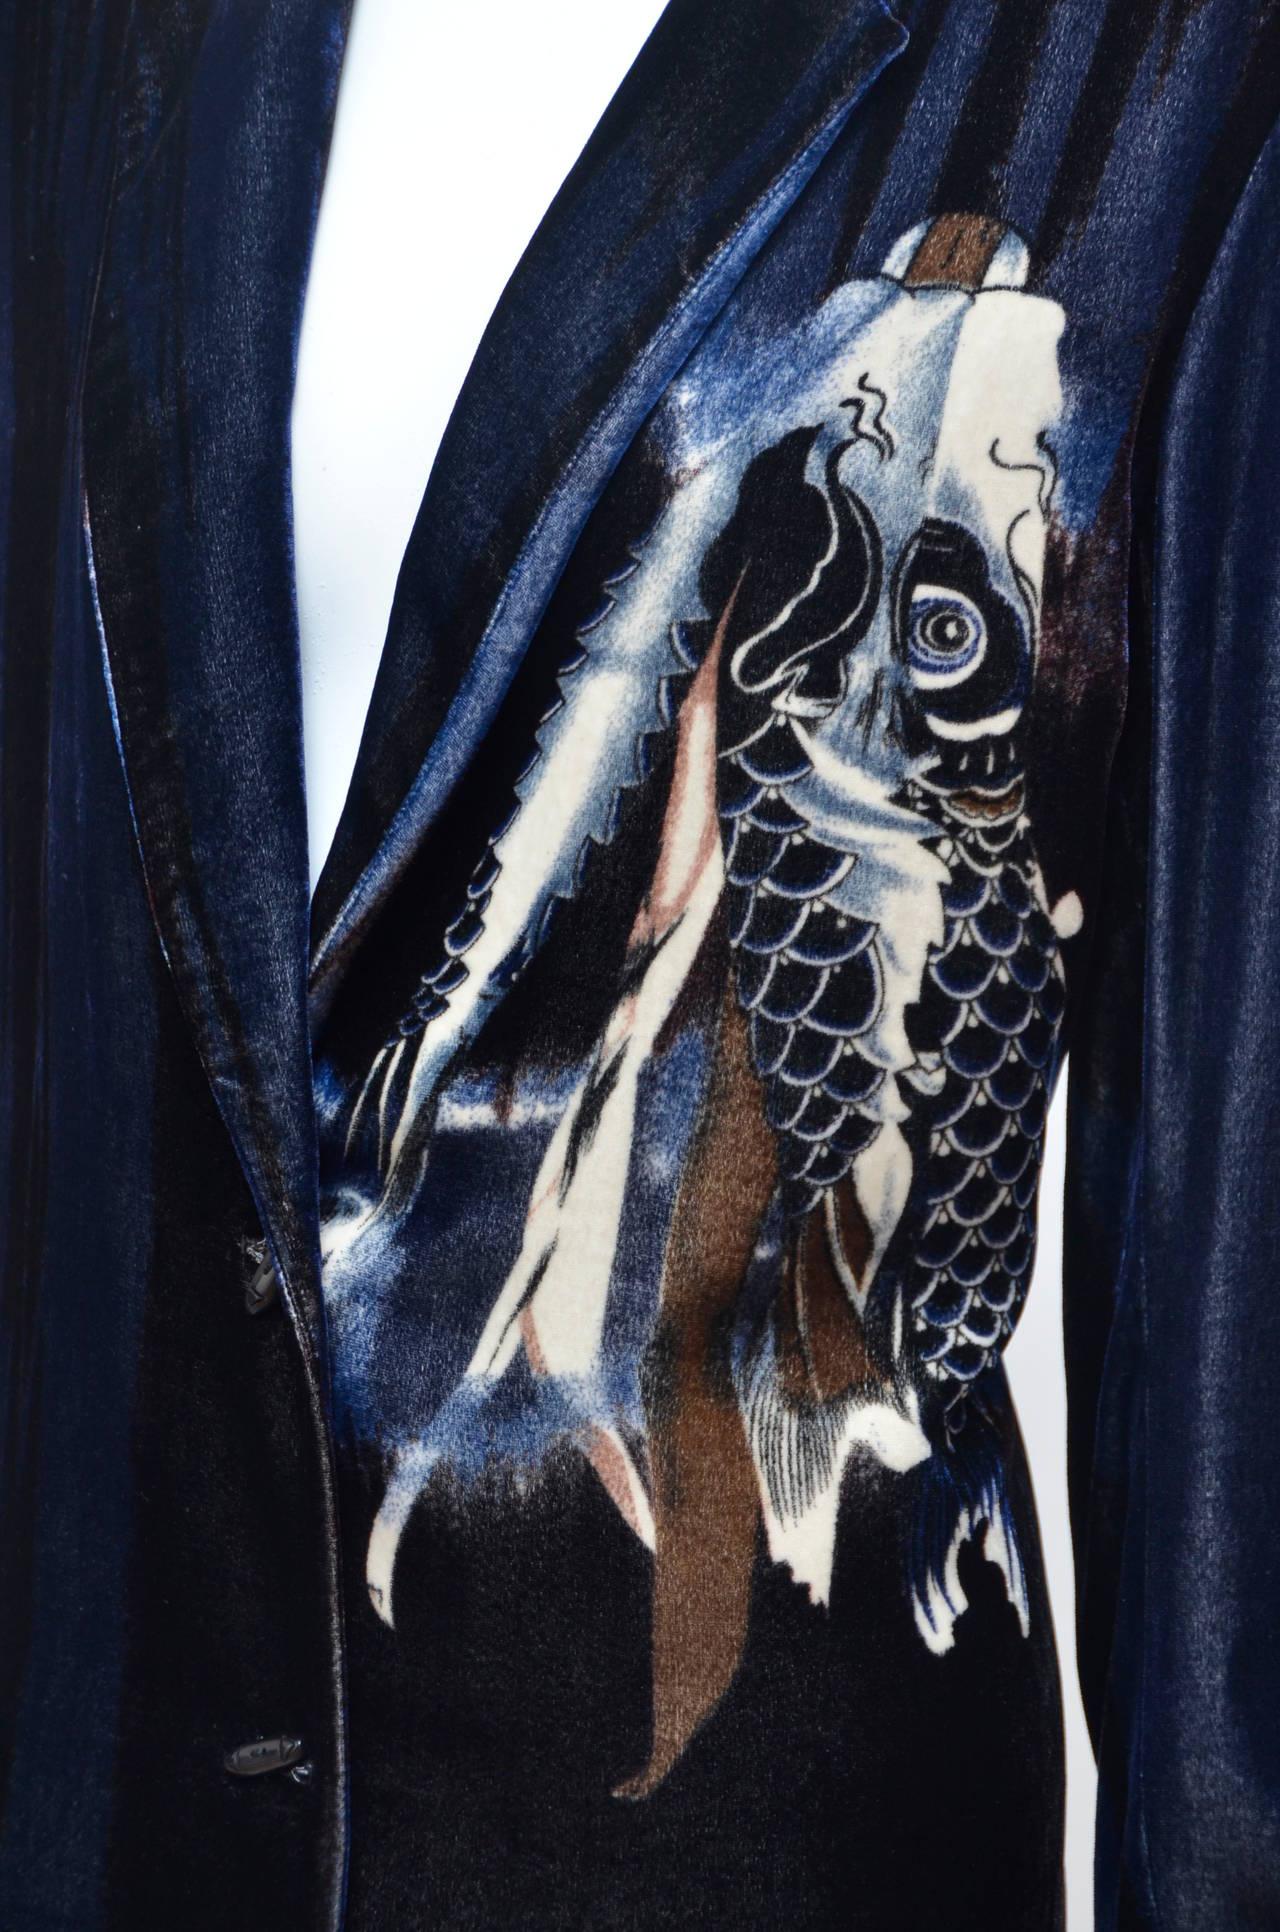 Harari koi fish velvet blazer jacket new at 1stdibs for Koi fish dress